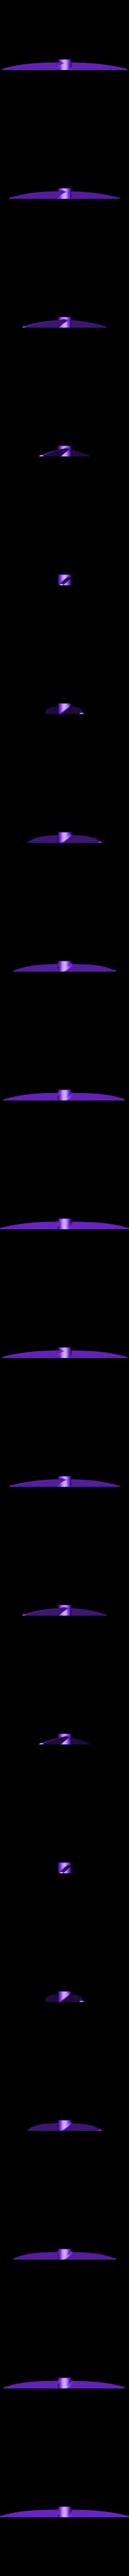 10-29-10019.STL Télécharger fichier STL gratuit Fokker DR.1 Triplane • Design imprimable en 3D, Ventwallader